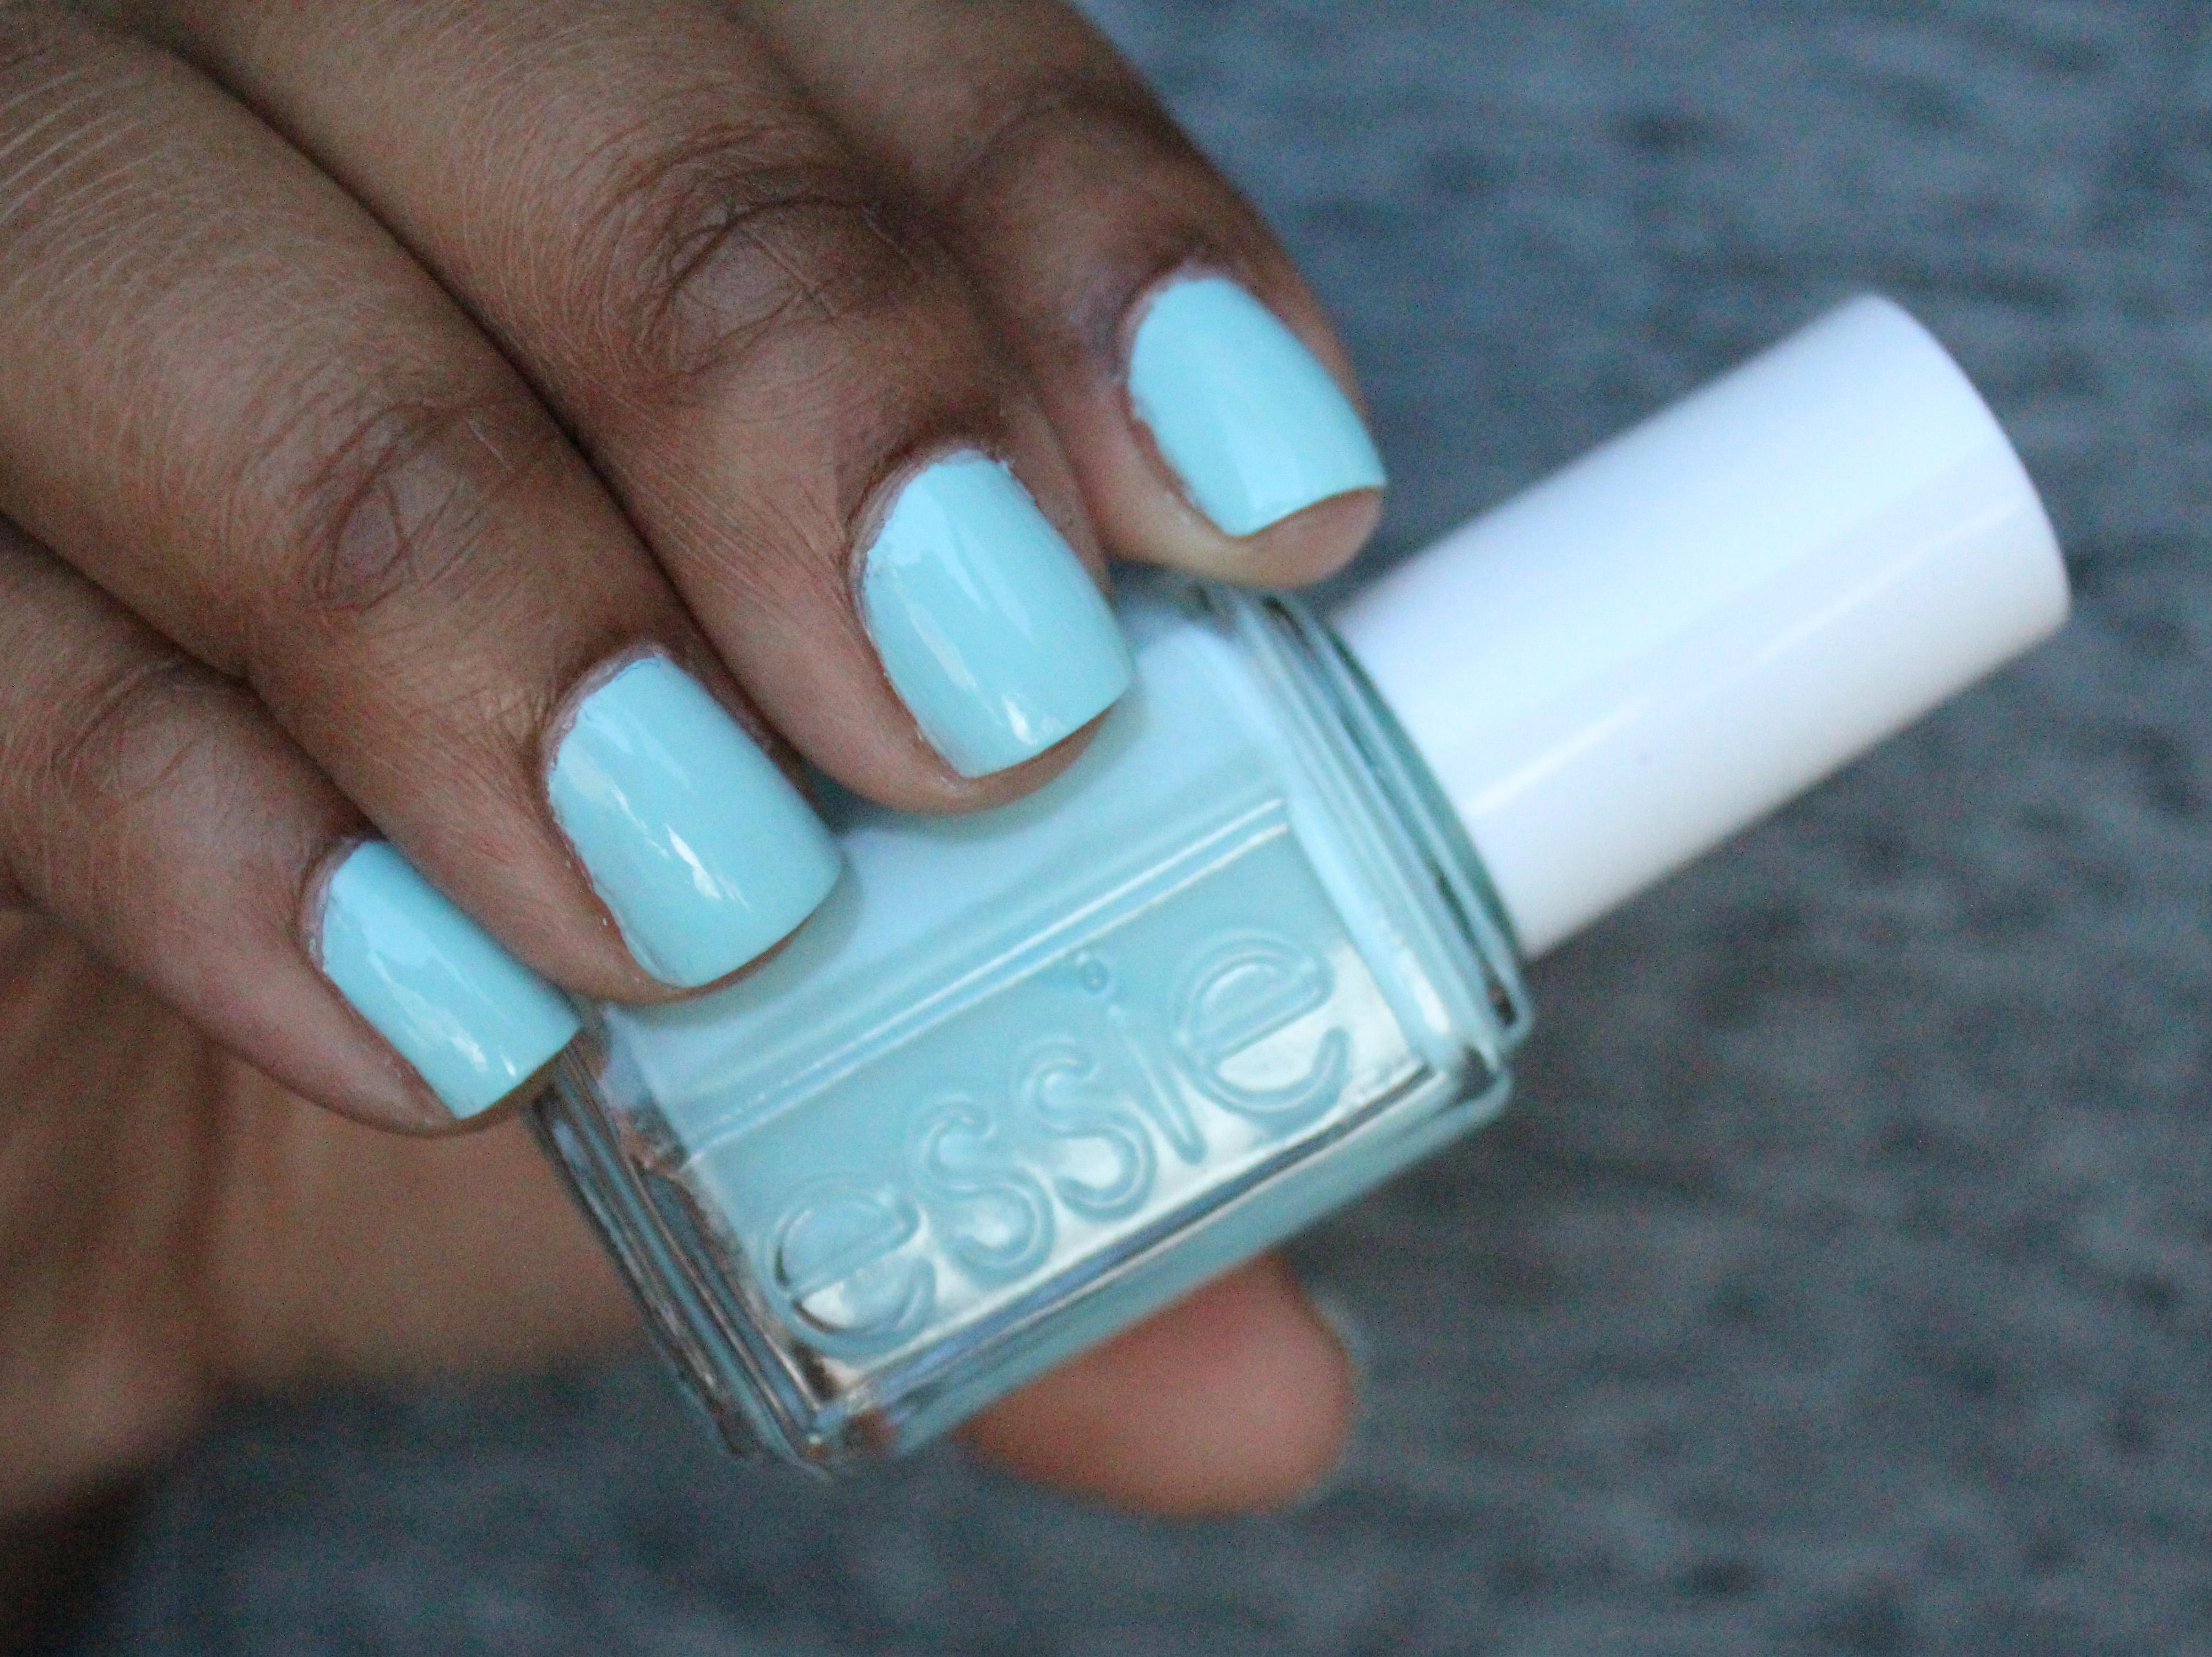 Blue Nail Polish On Black Skin - To Bend Light